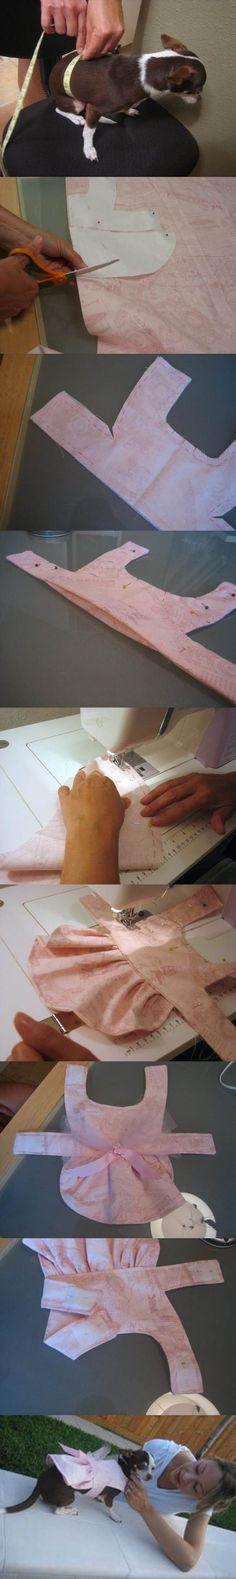 DIY Pink Stylish Dog Dress 2